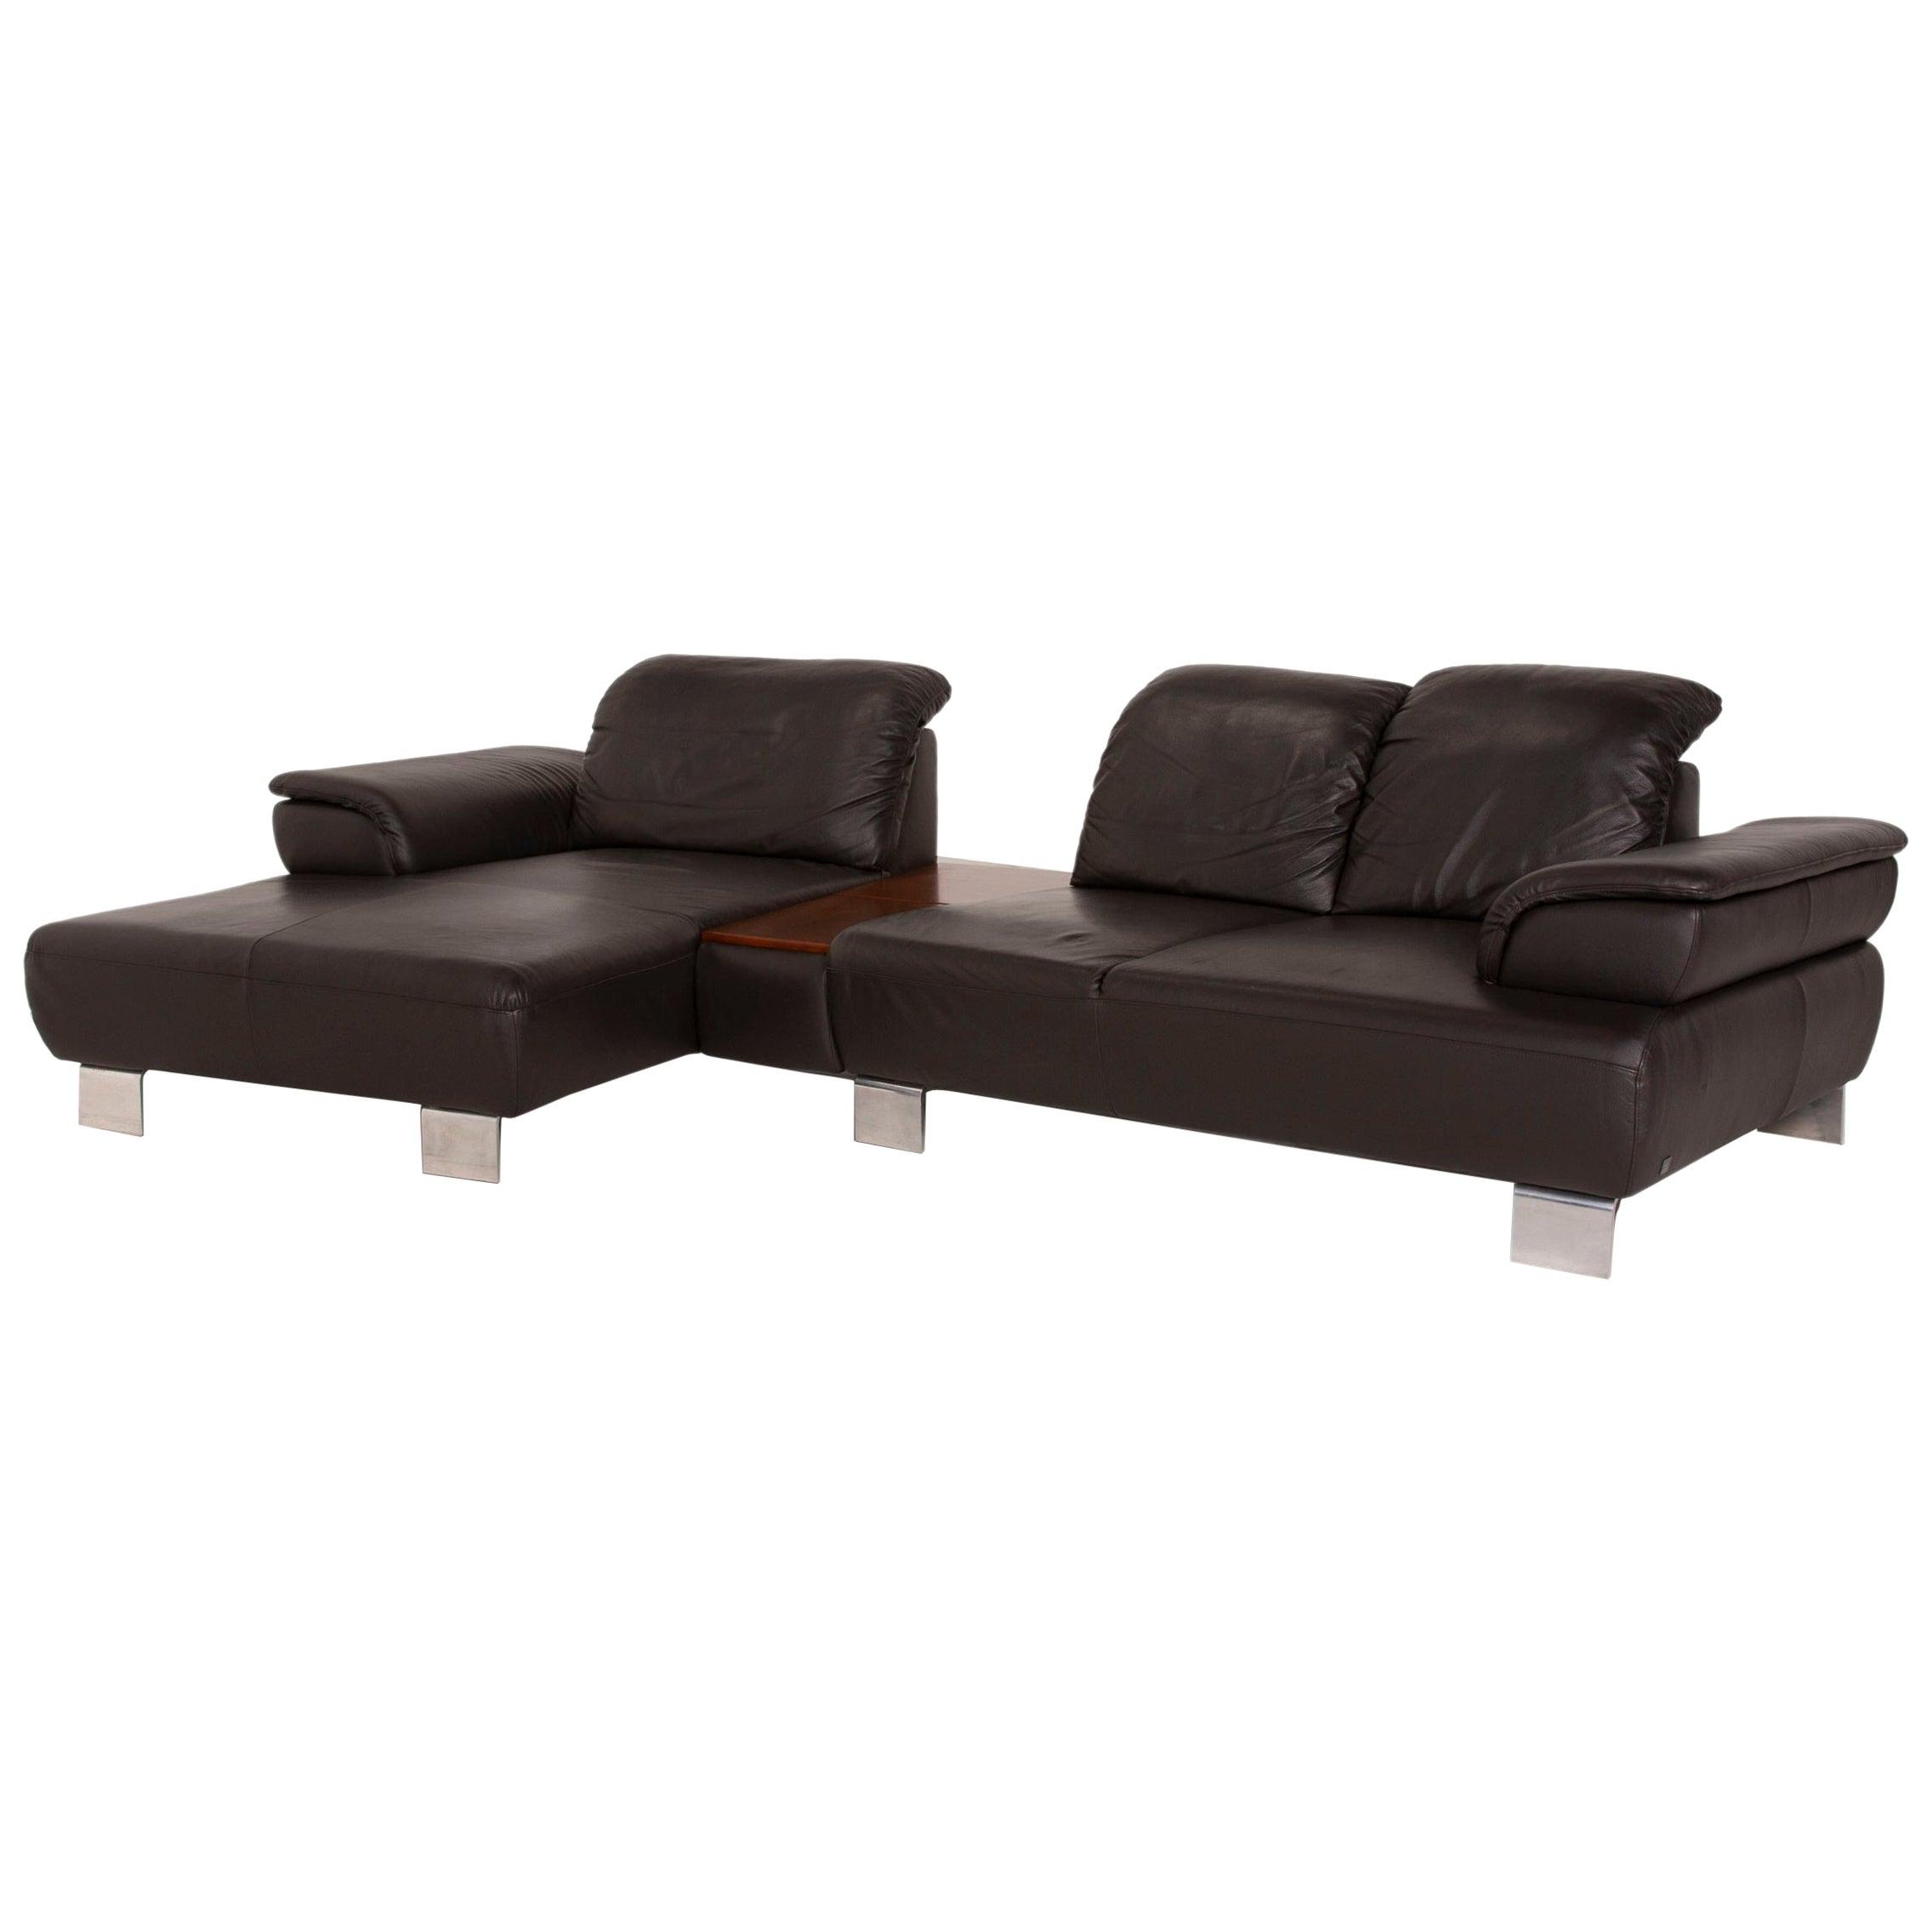 Willi Schillig Leather Sofa Brown Corner Sofa Function Dark Brown